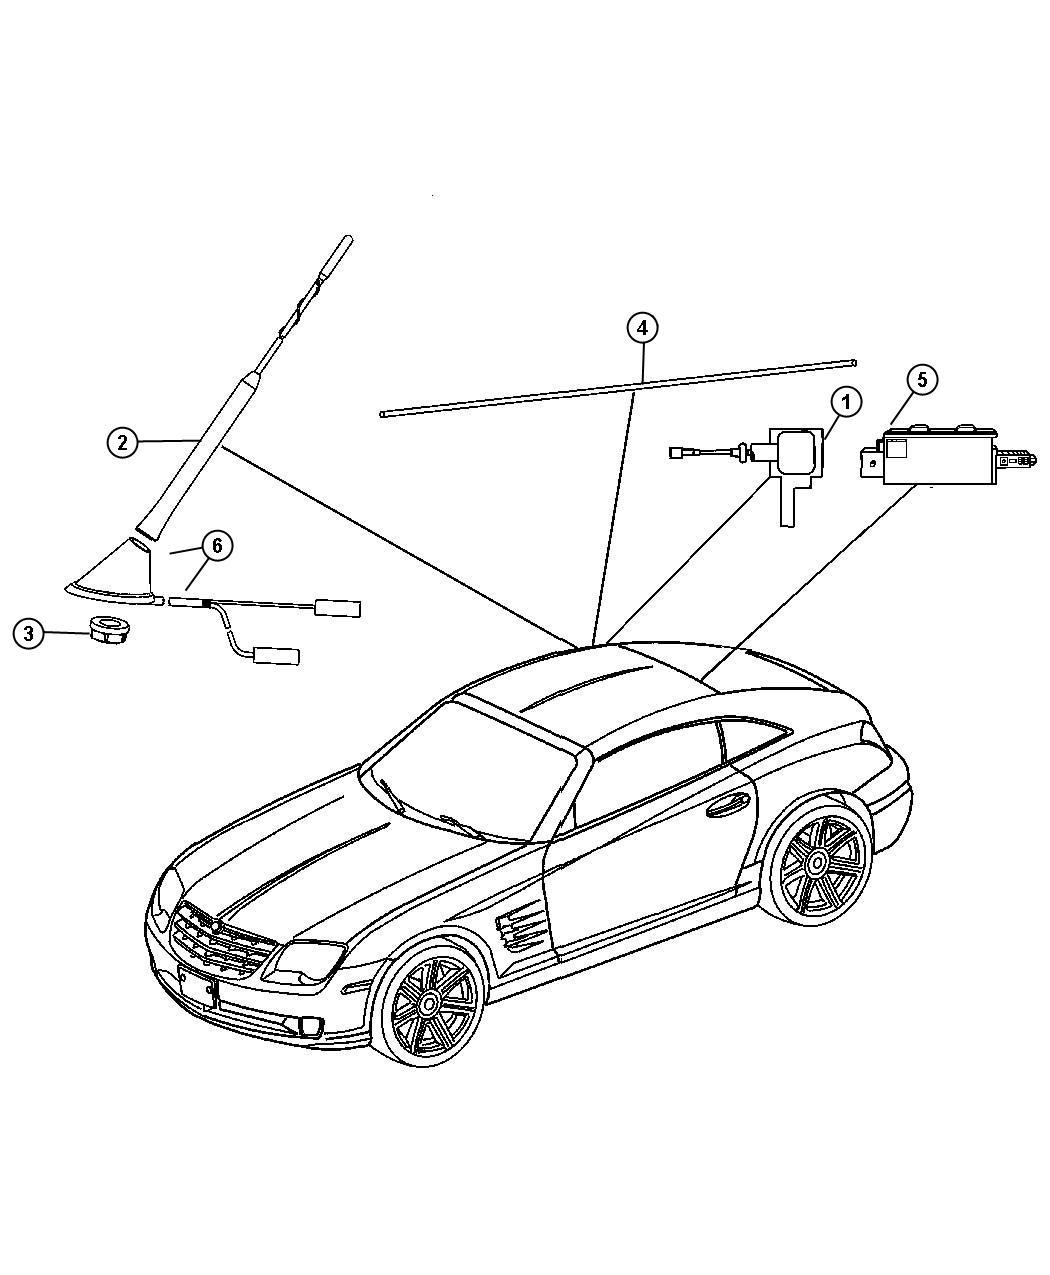 Service Manual Chrysler Crossfire Antenna Repair